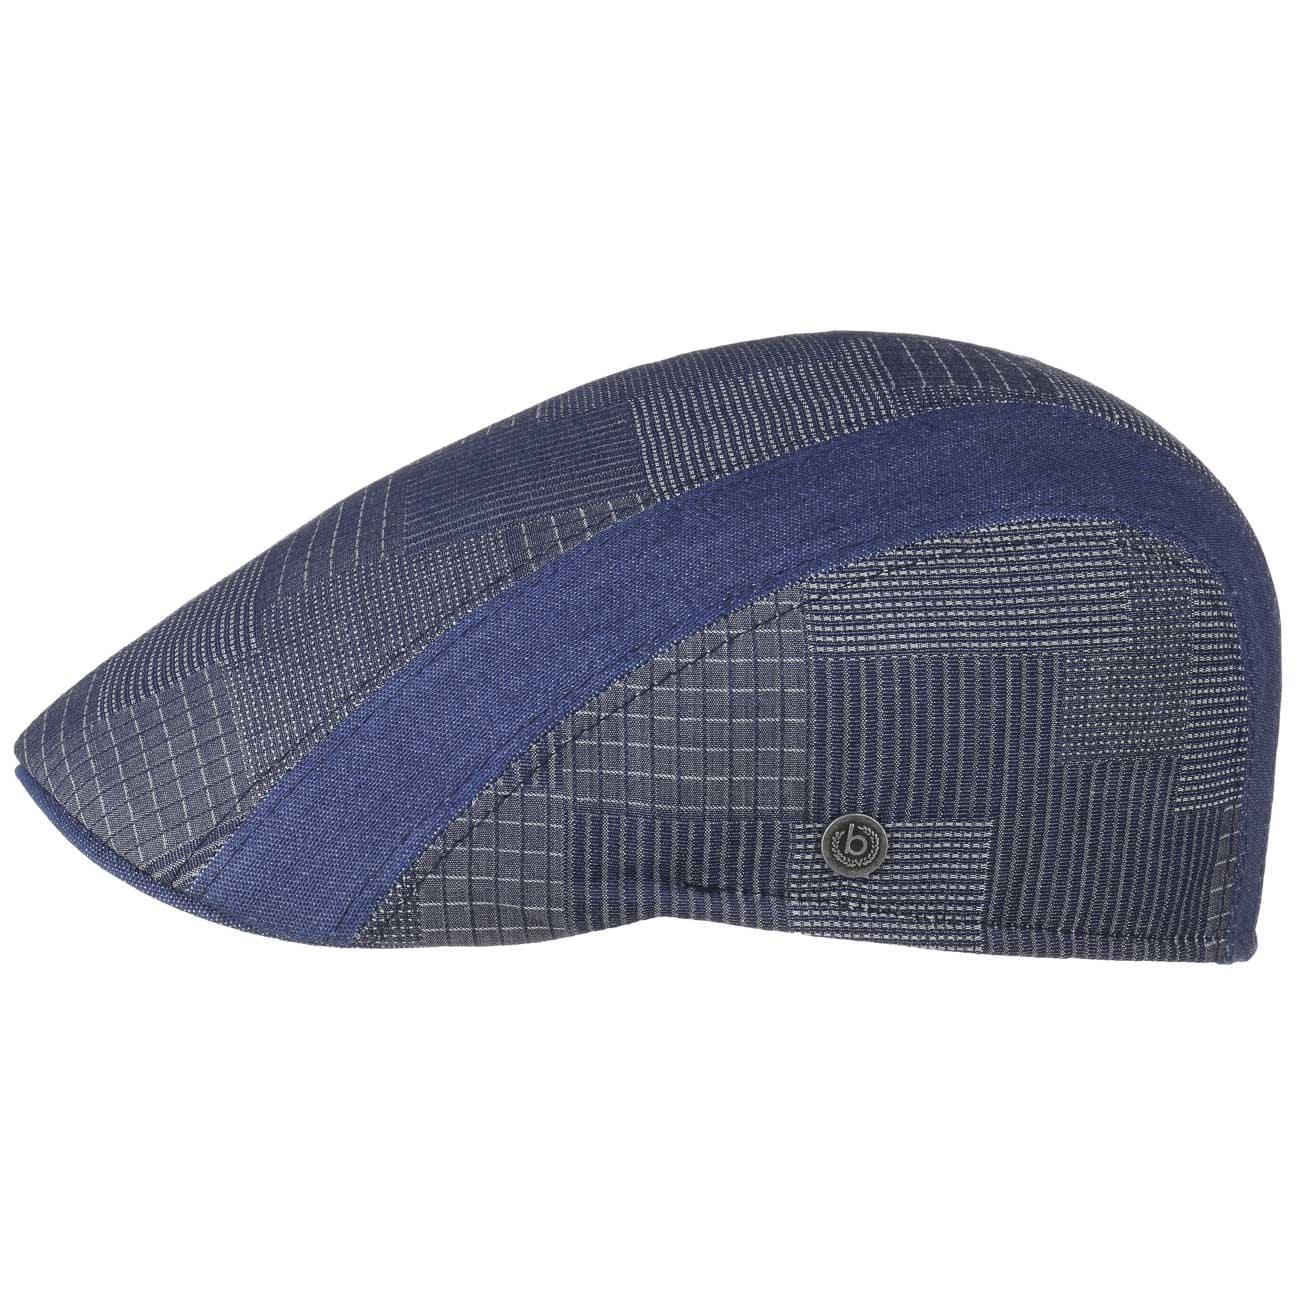 Gorra de Algod?n Patchwork by bugatti  gorra de verano